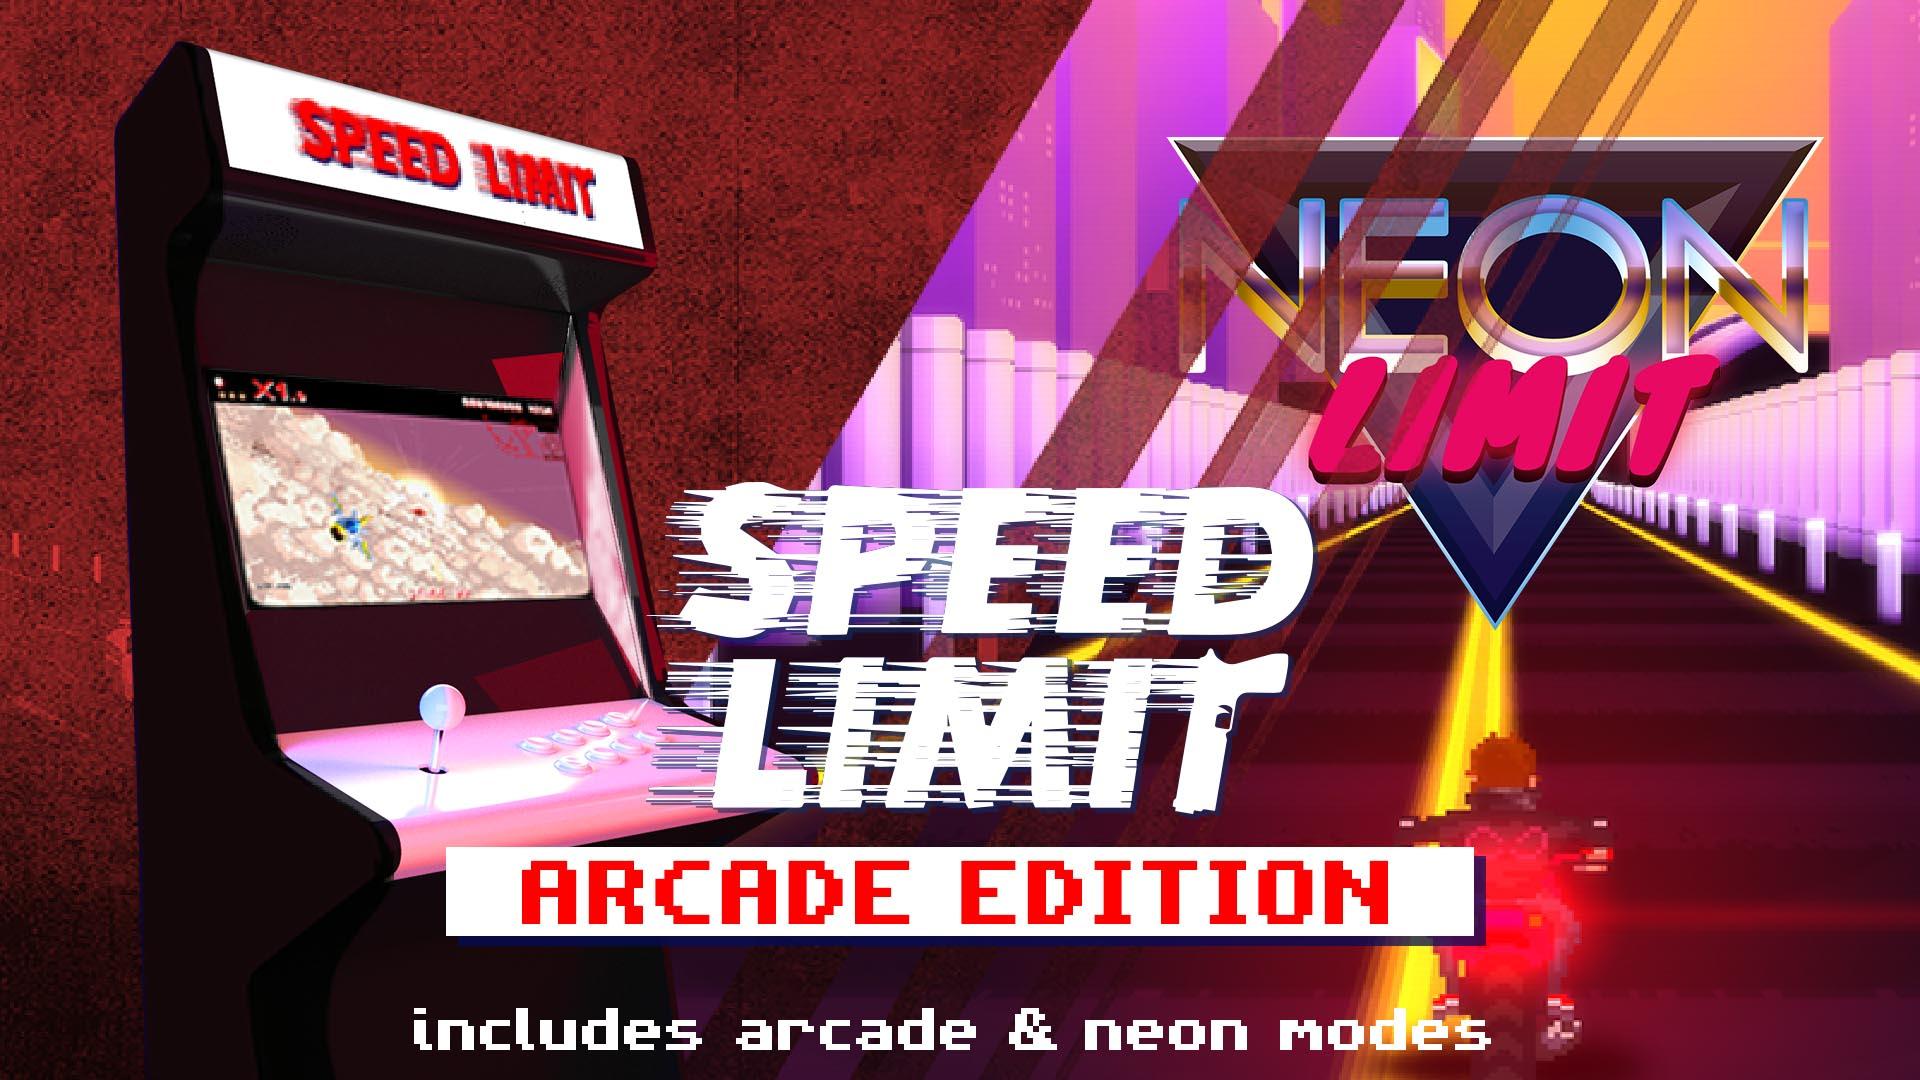 1902x1080 arcade edition